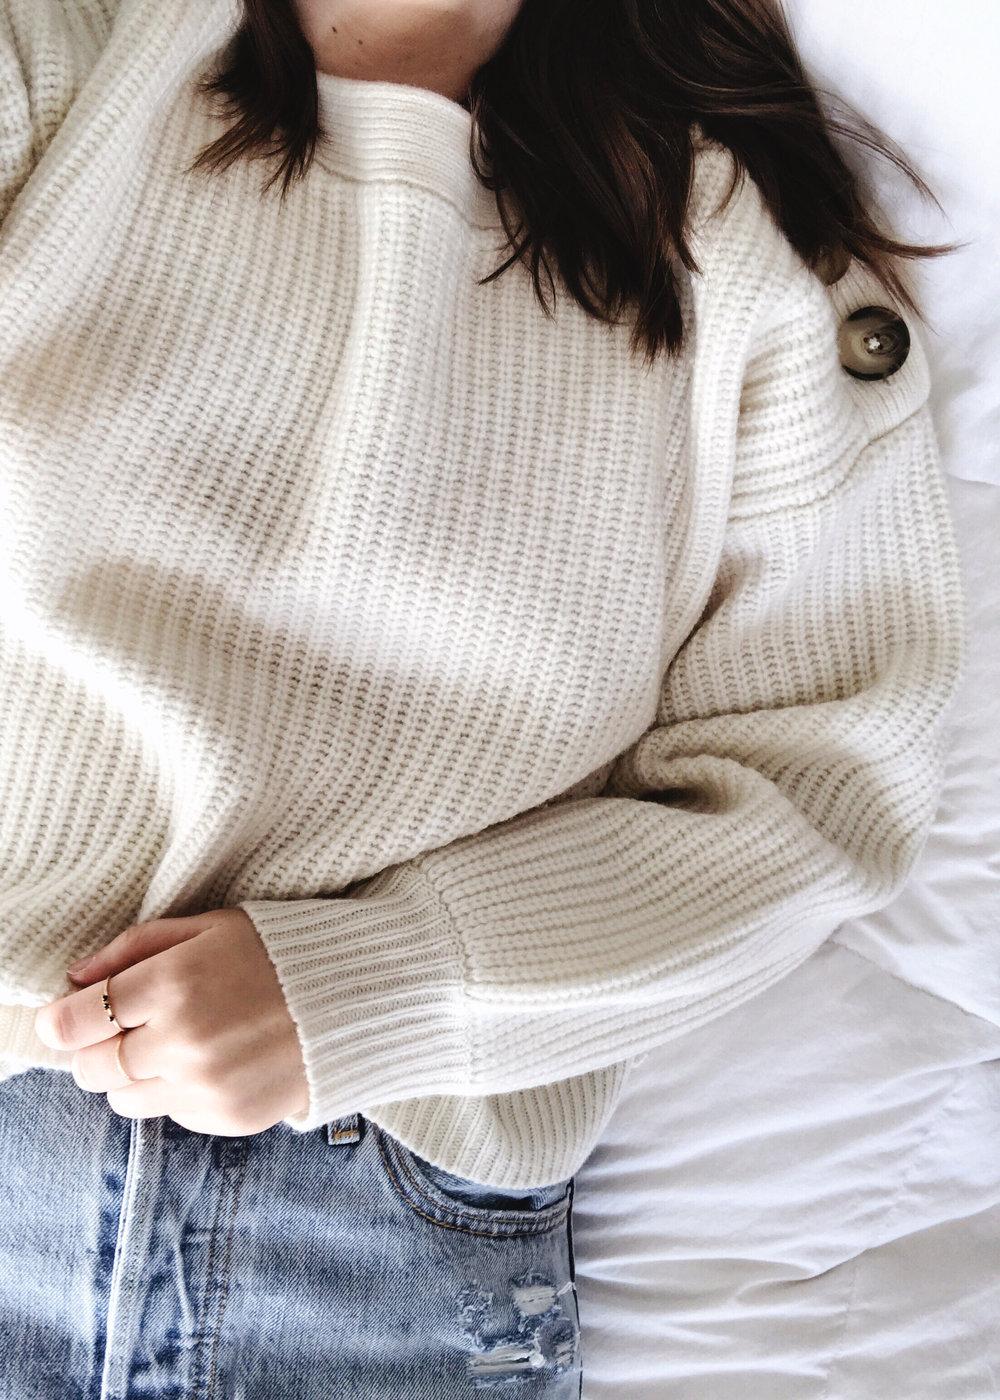 1RP_jan_madewell_sweater.JPG